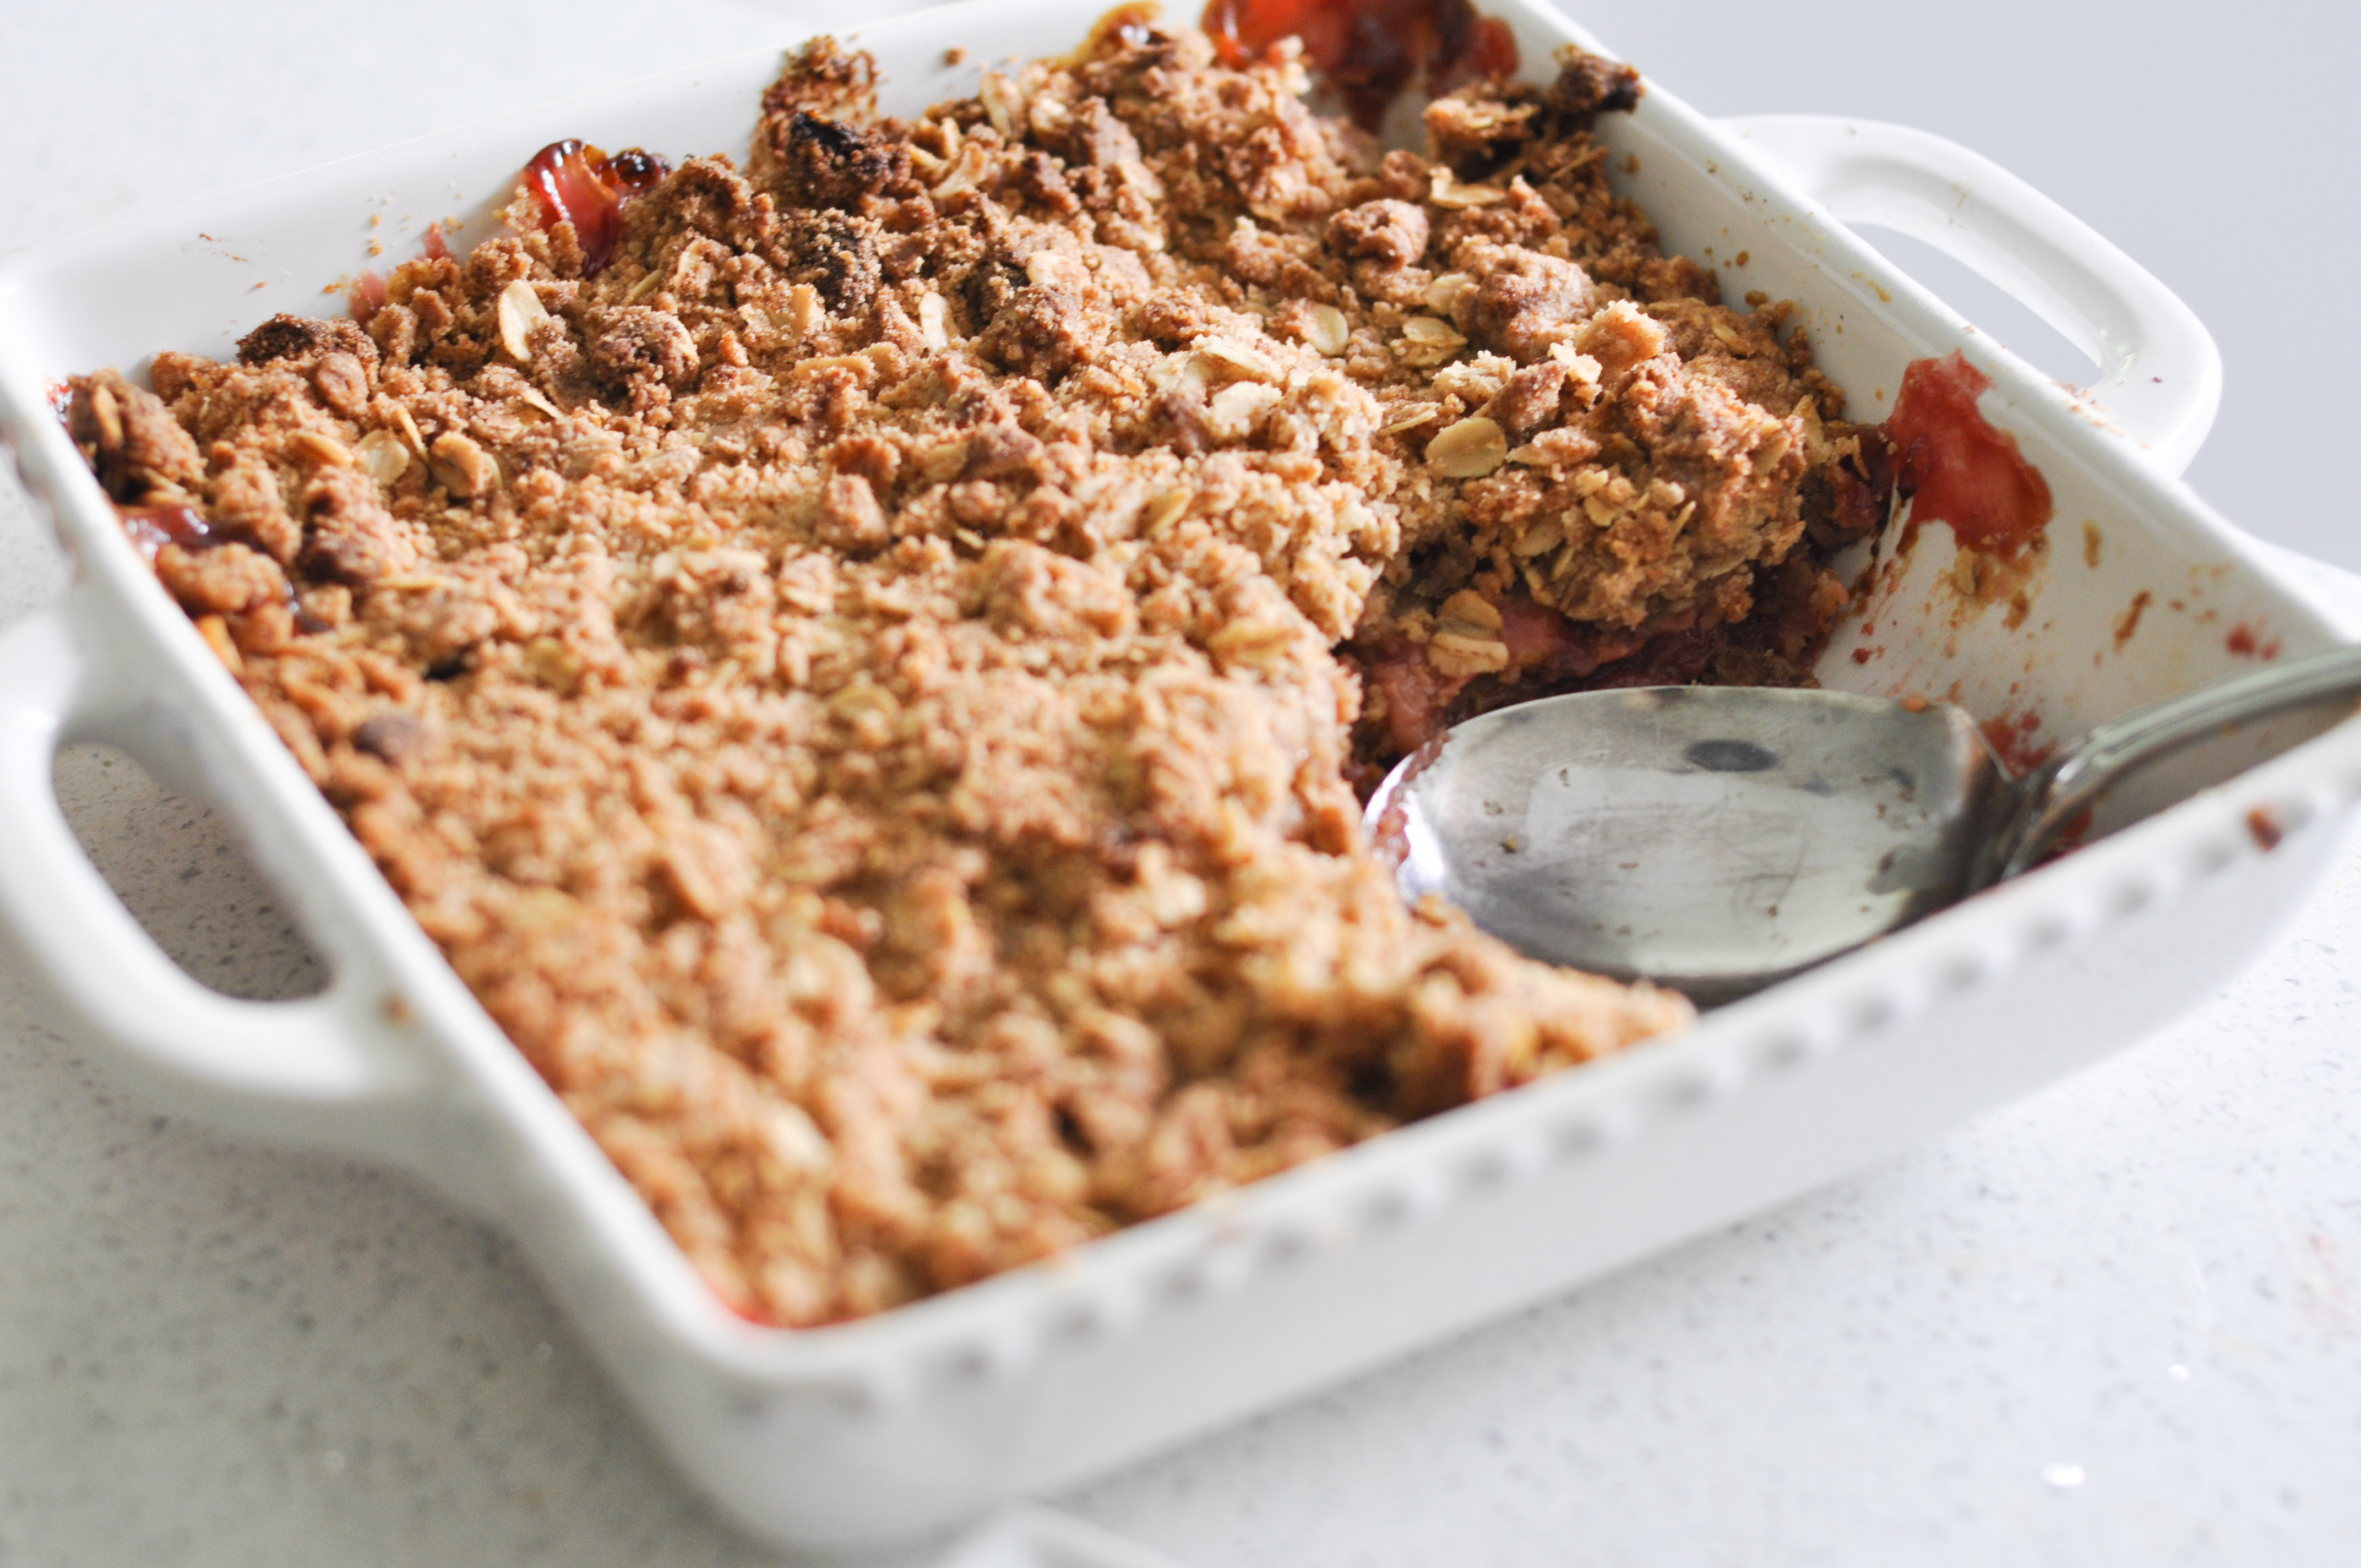 Strawberry Rhubarb Crumble - Suburble